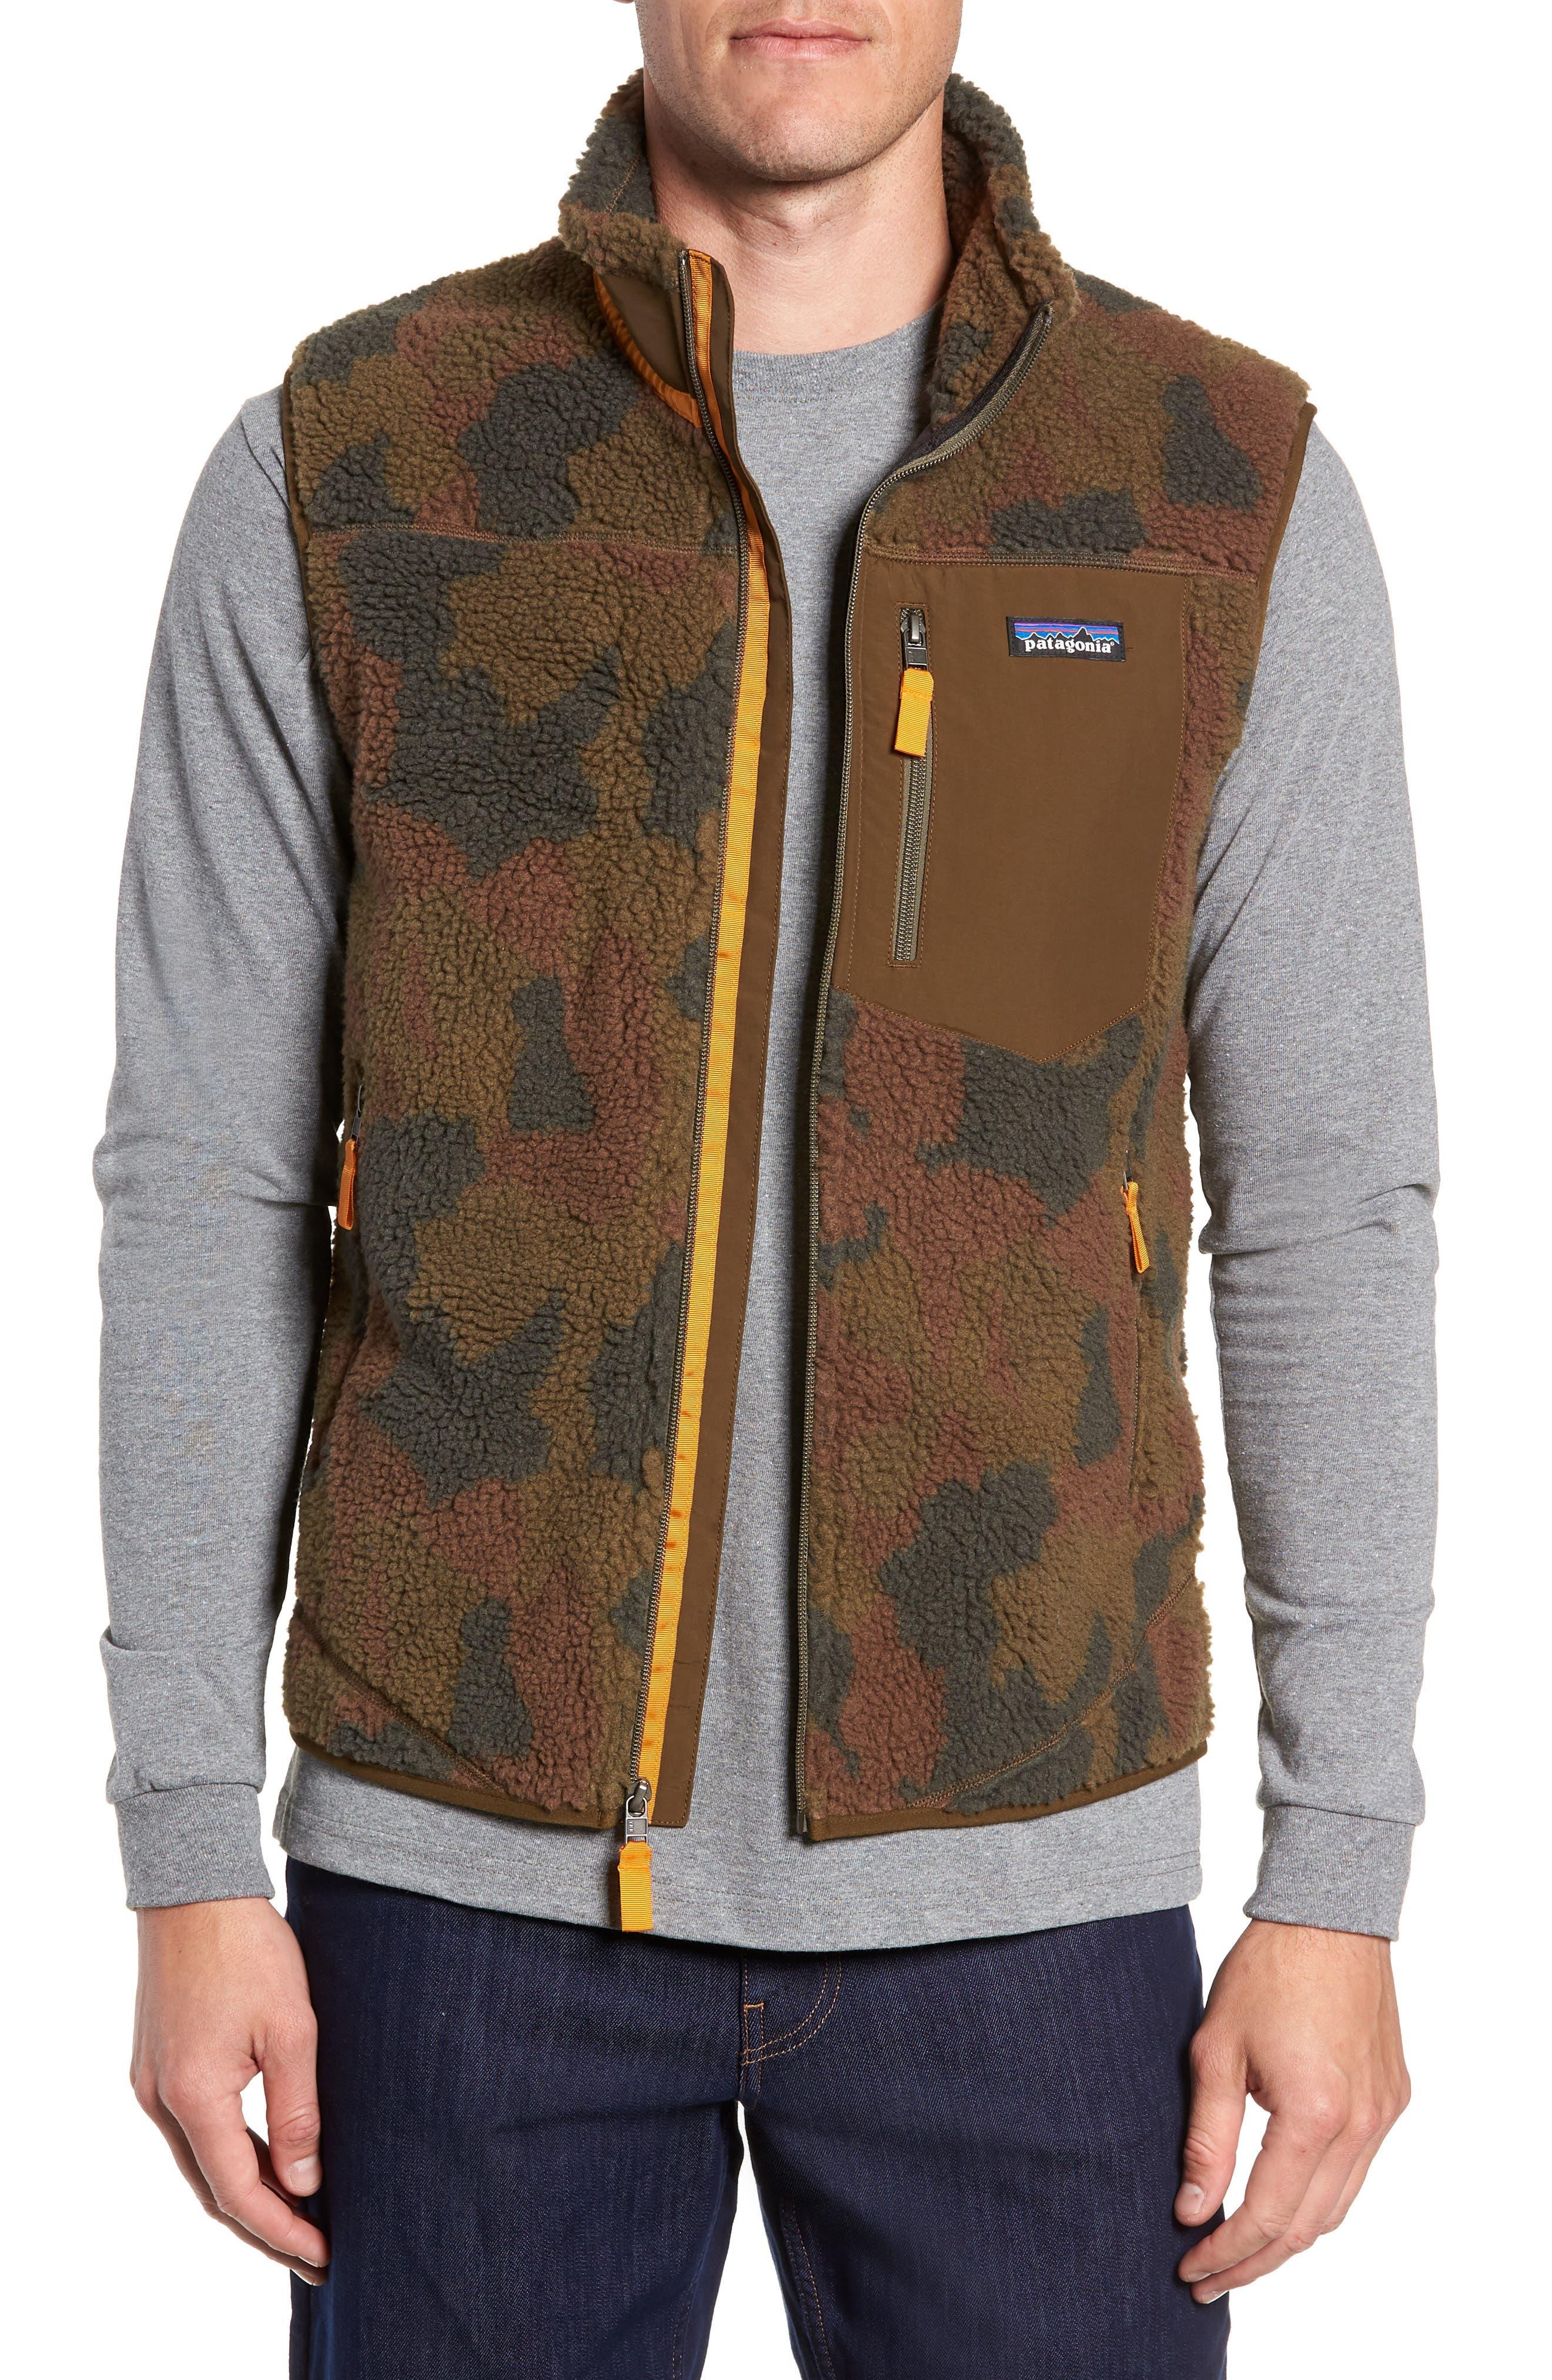 Classic Retro-X<sup>®</sup> Windproof Vest,                         Main,                         color, BUNKER CAMO CARGO GREEN